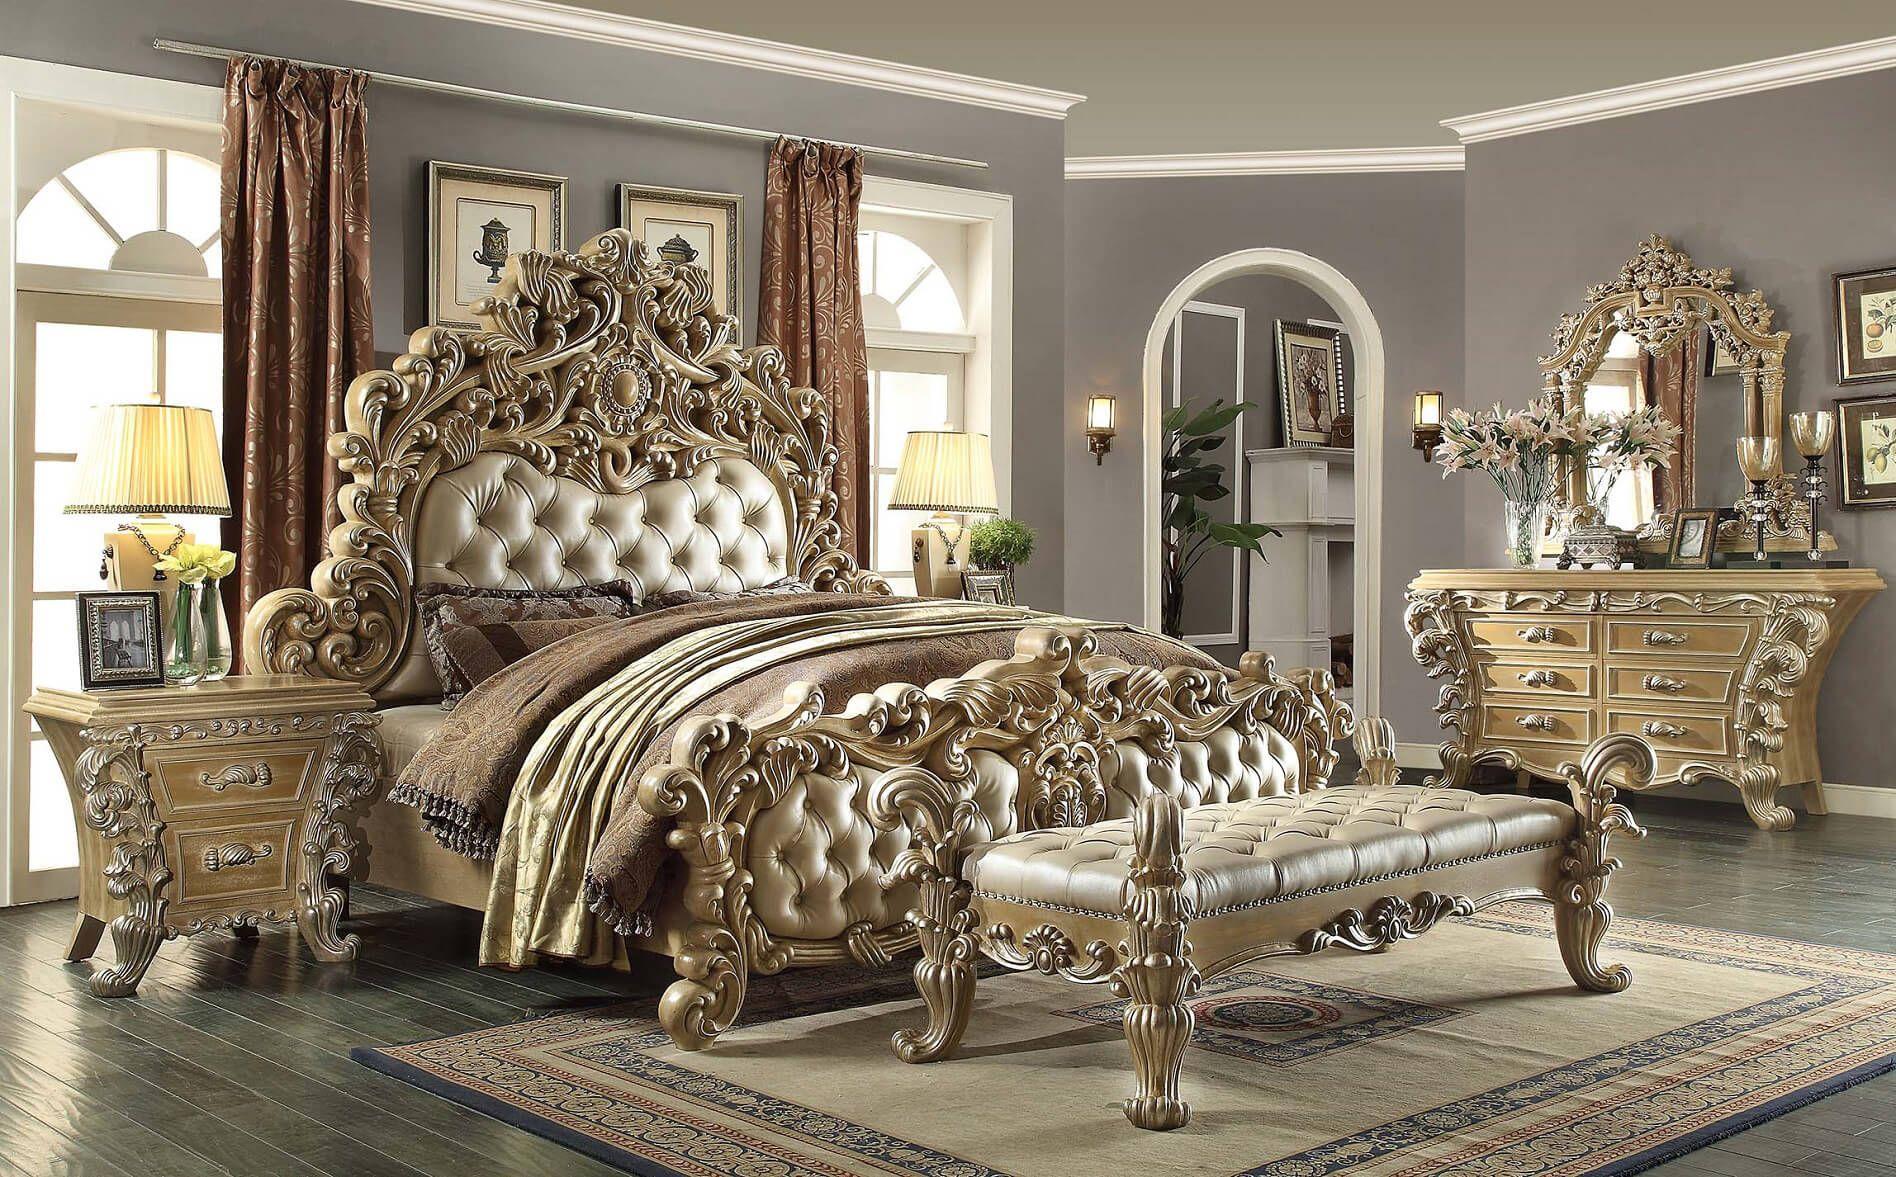 Homey Design Royal Kingdom Hd 7012 Bed Luxury Bedroom Sets